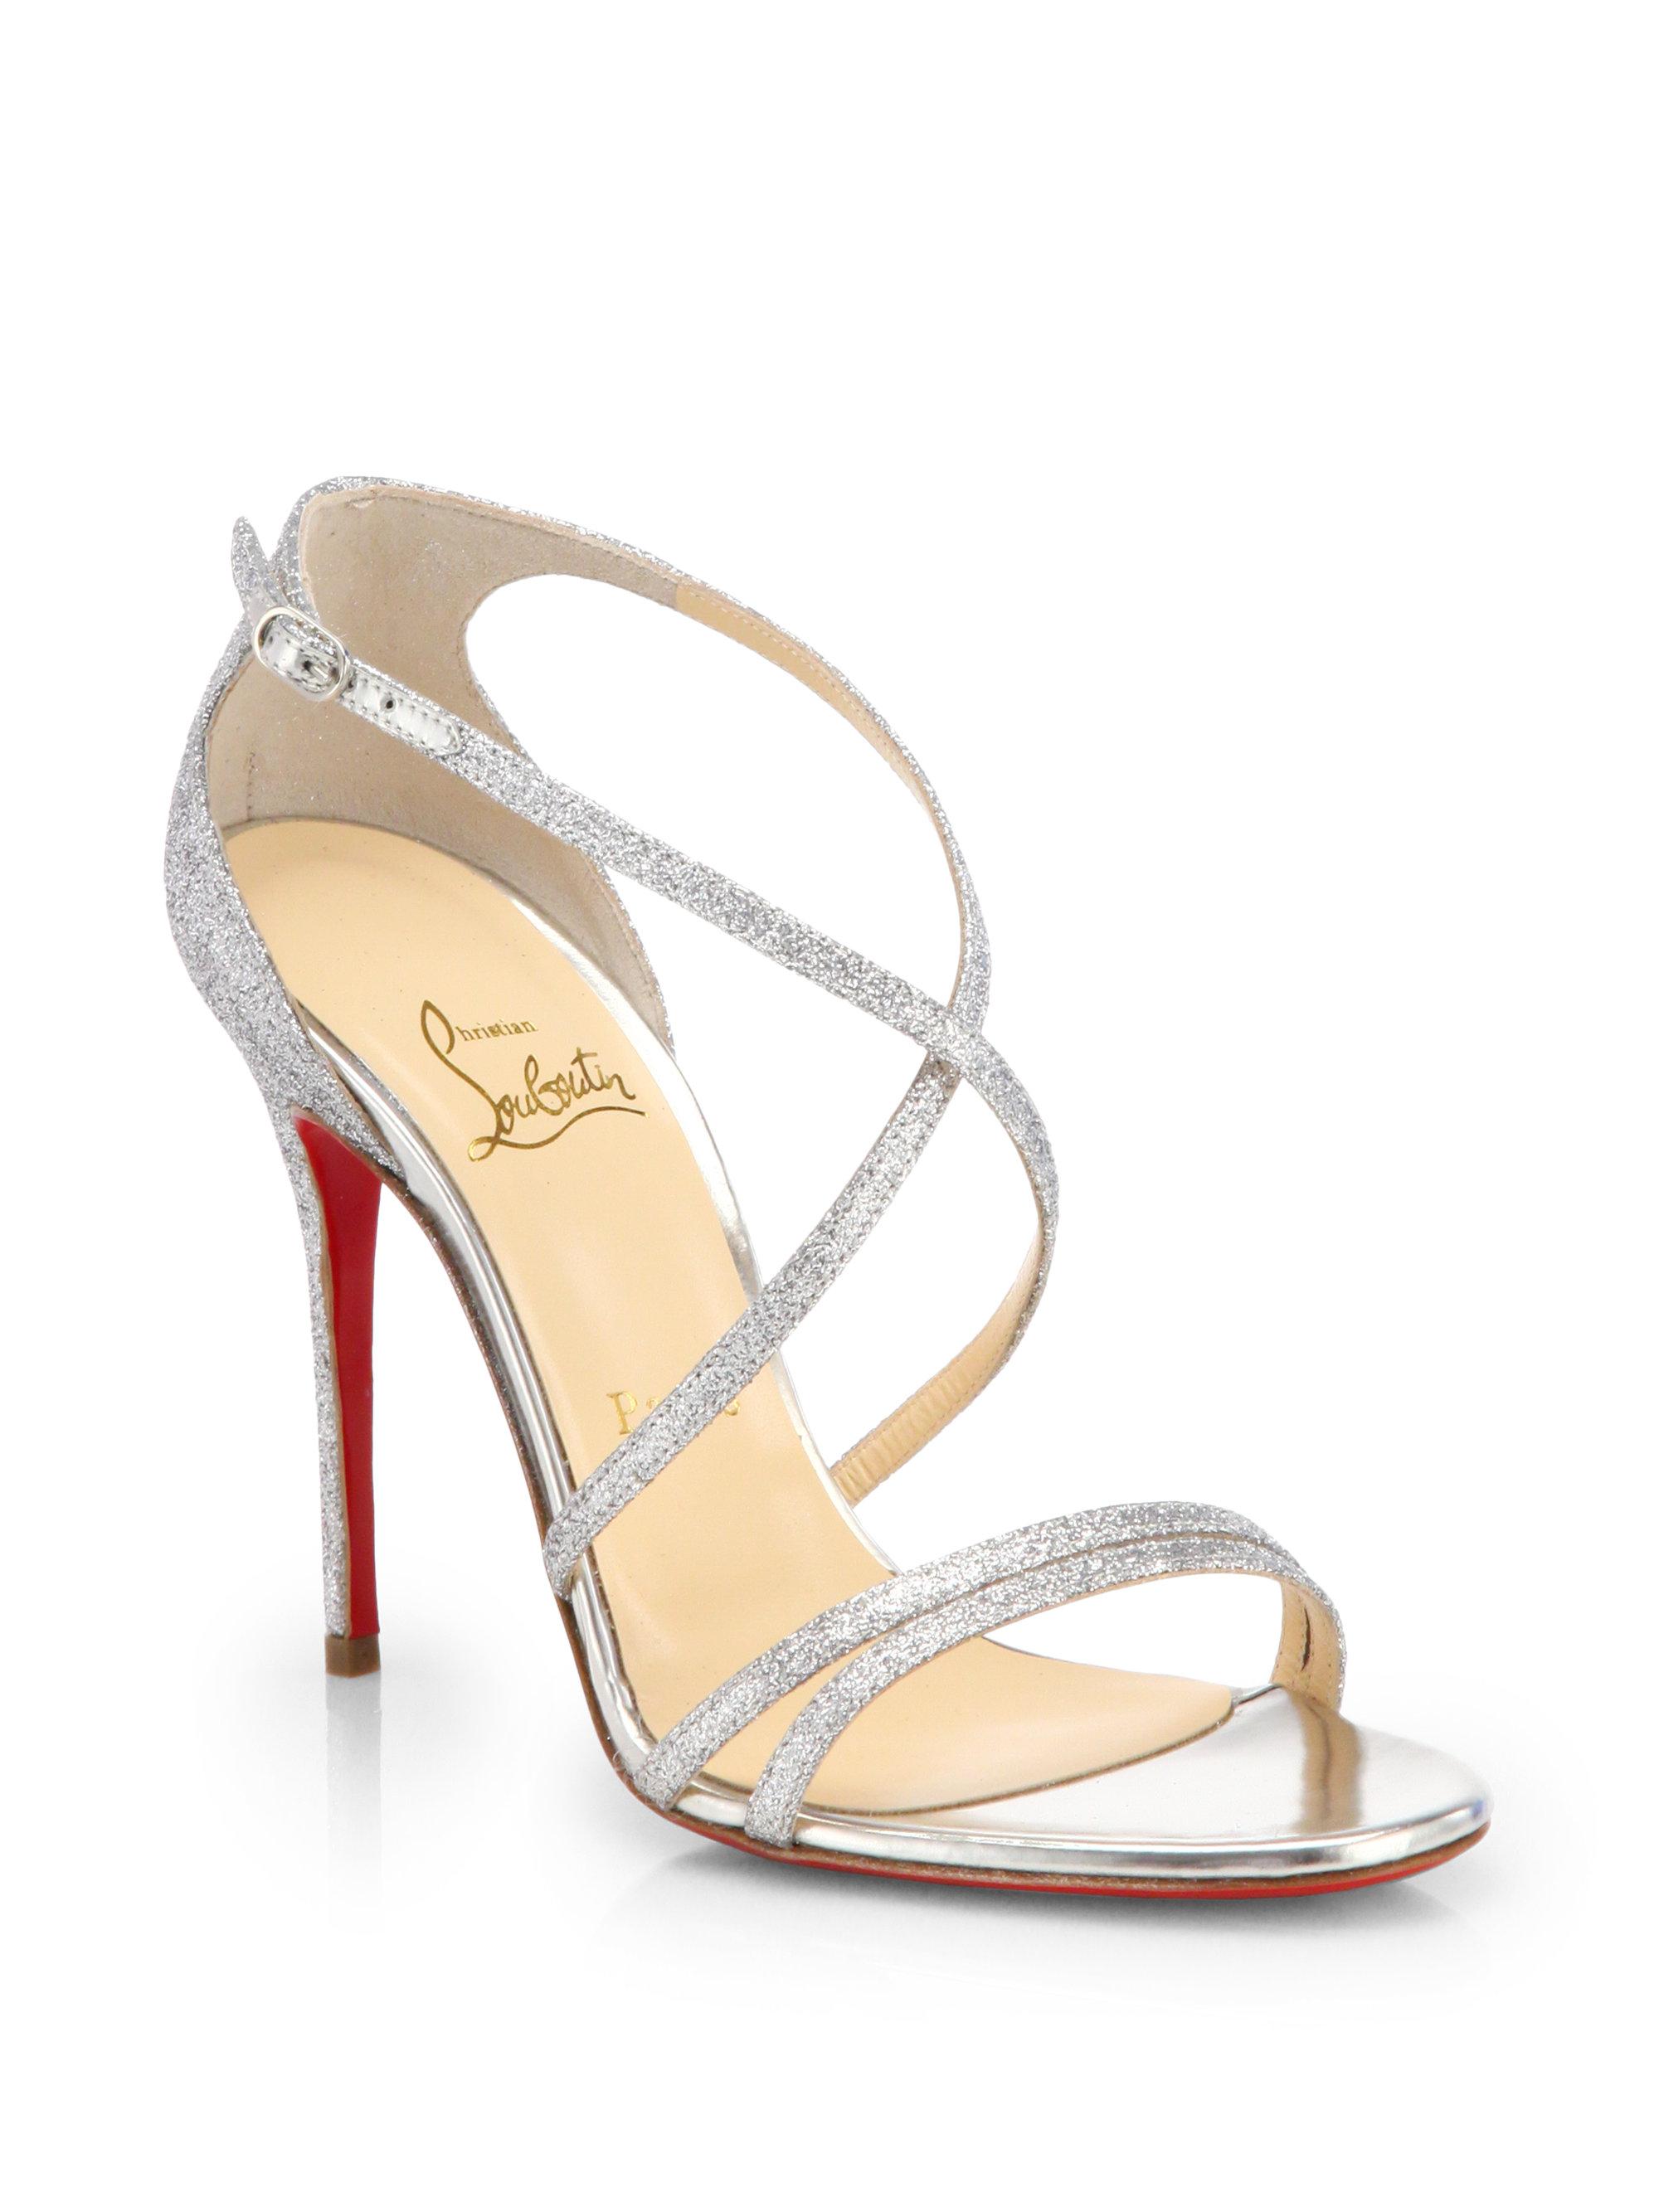 f40e8d56622 ... cheapest lyst christian louboutin gwynitta glitter sandals in metallic  4f7eb 8e817